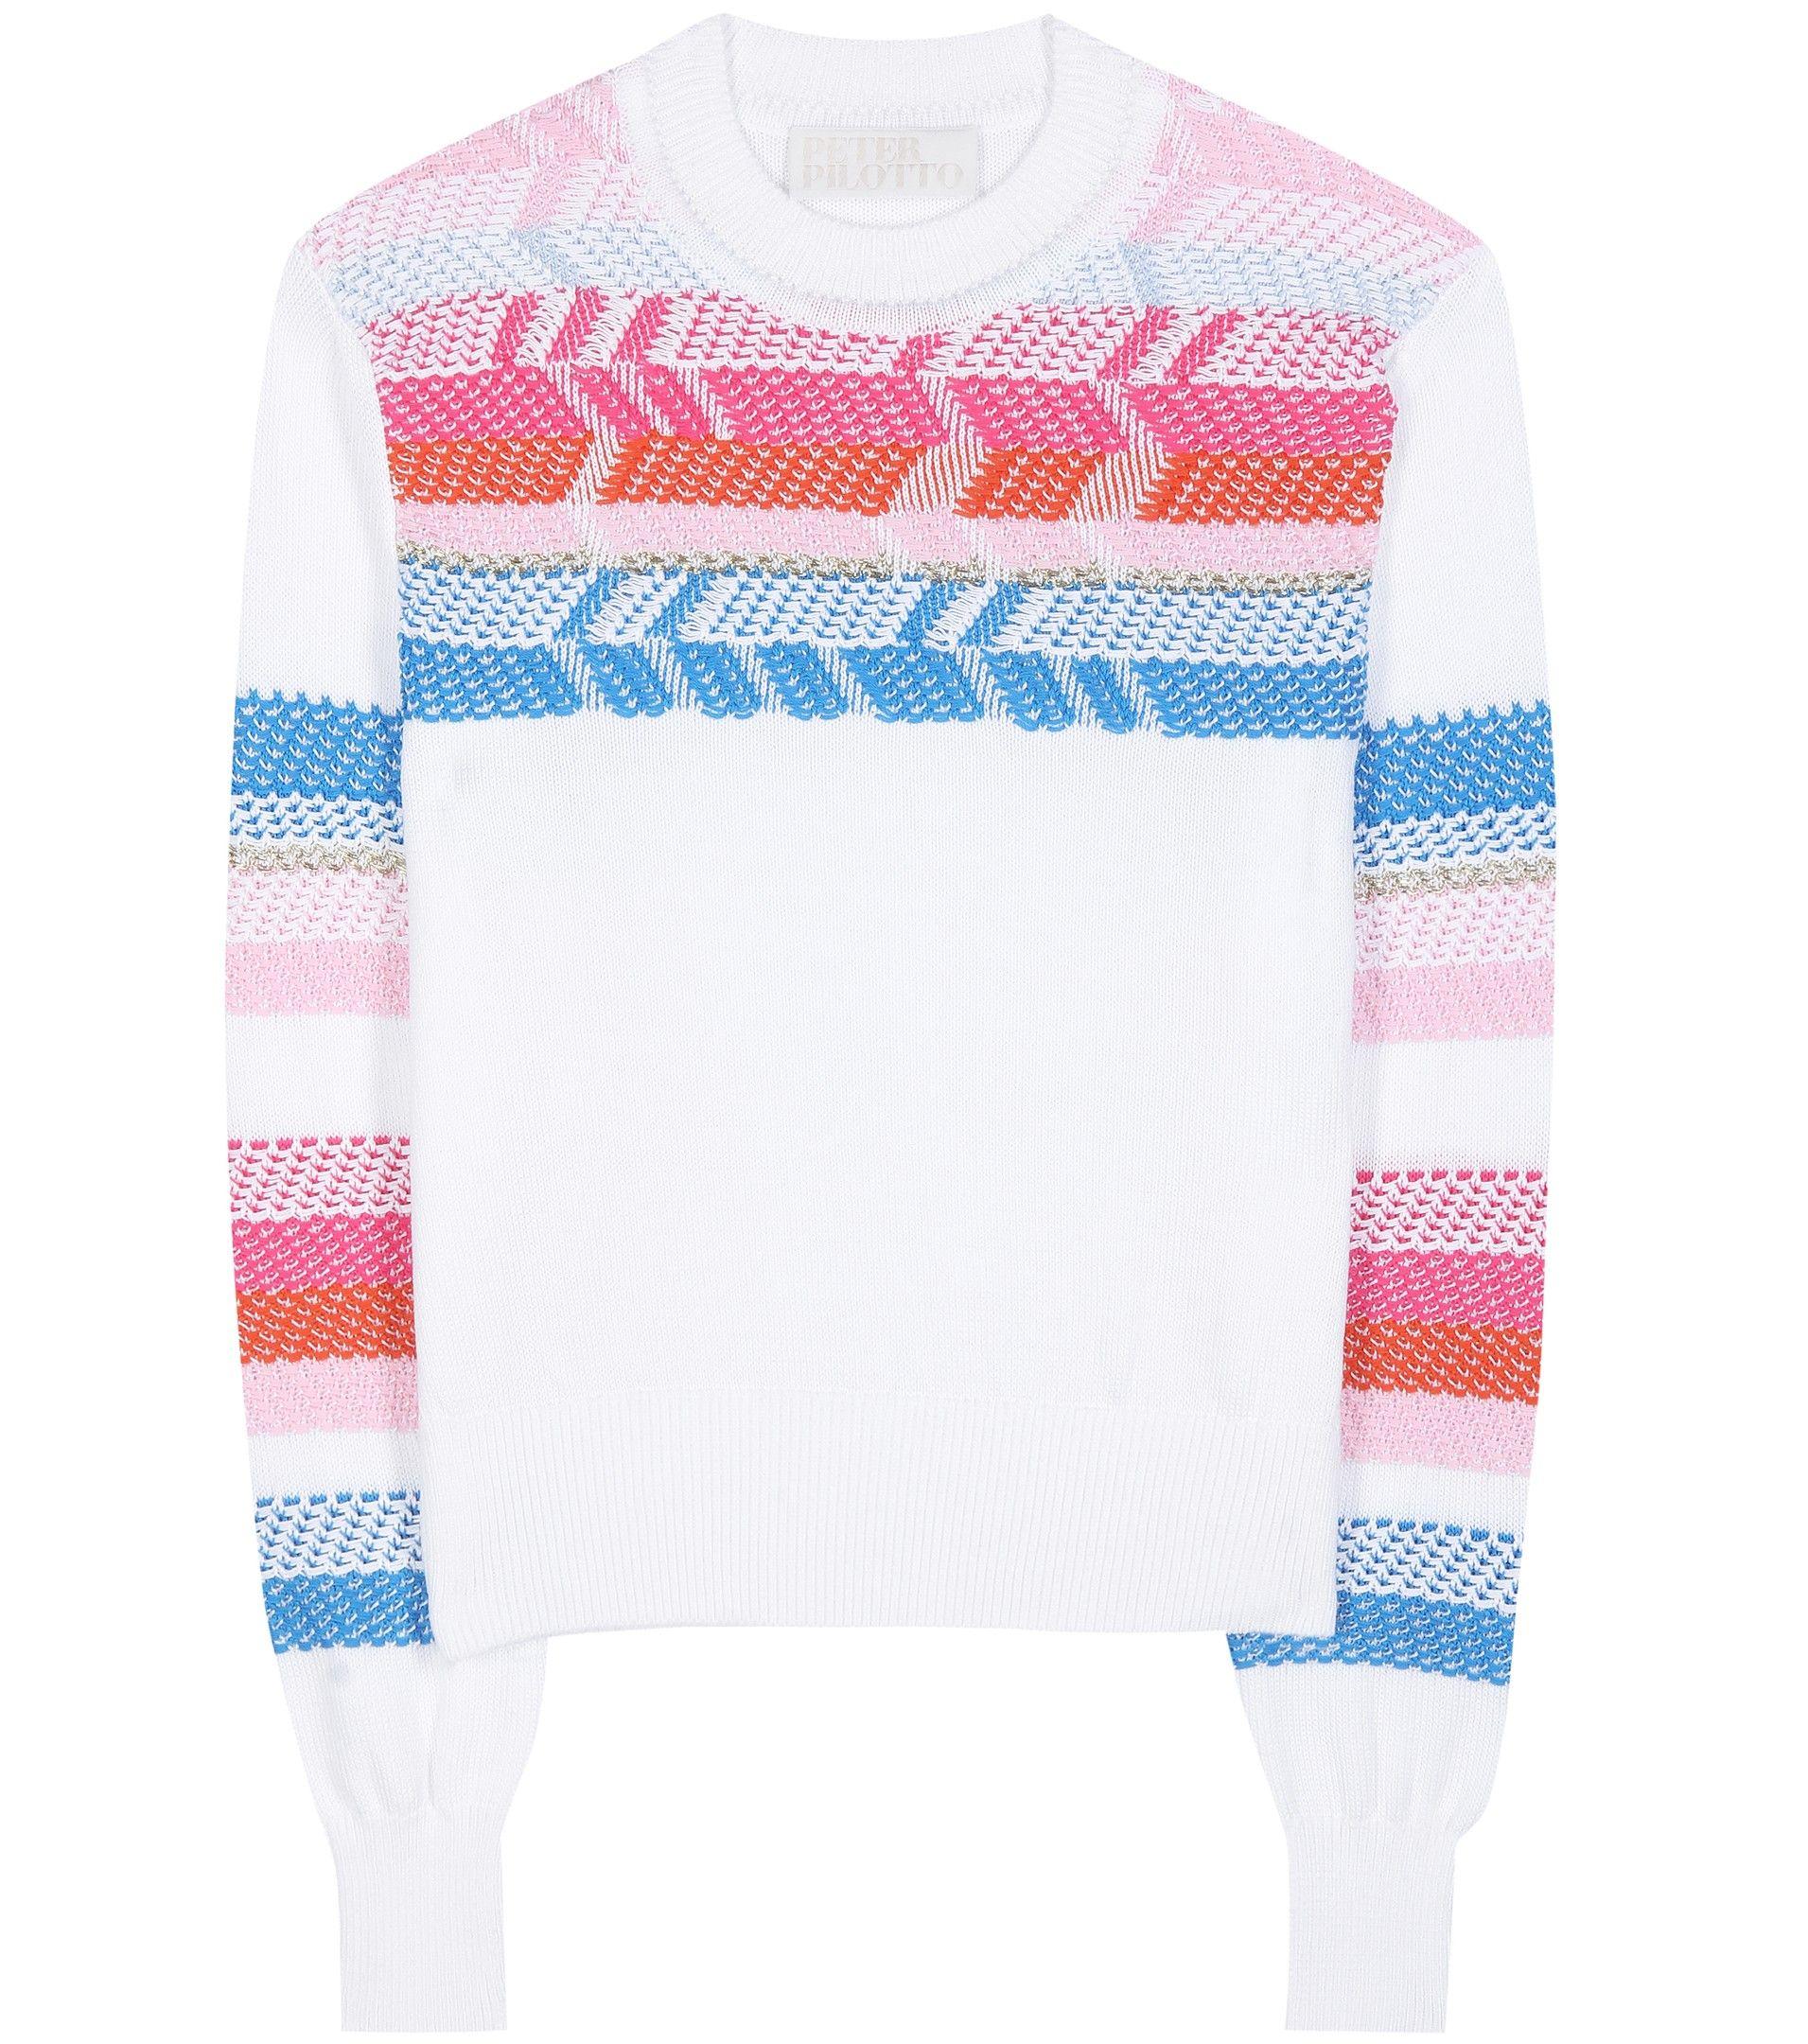 Peruvian Knit White Cotton Sweater By Peter Pilotto